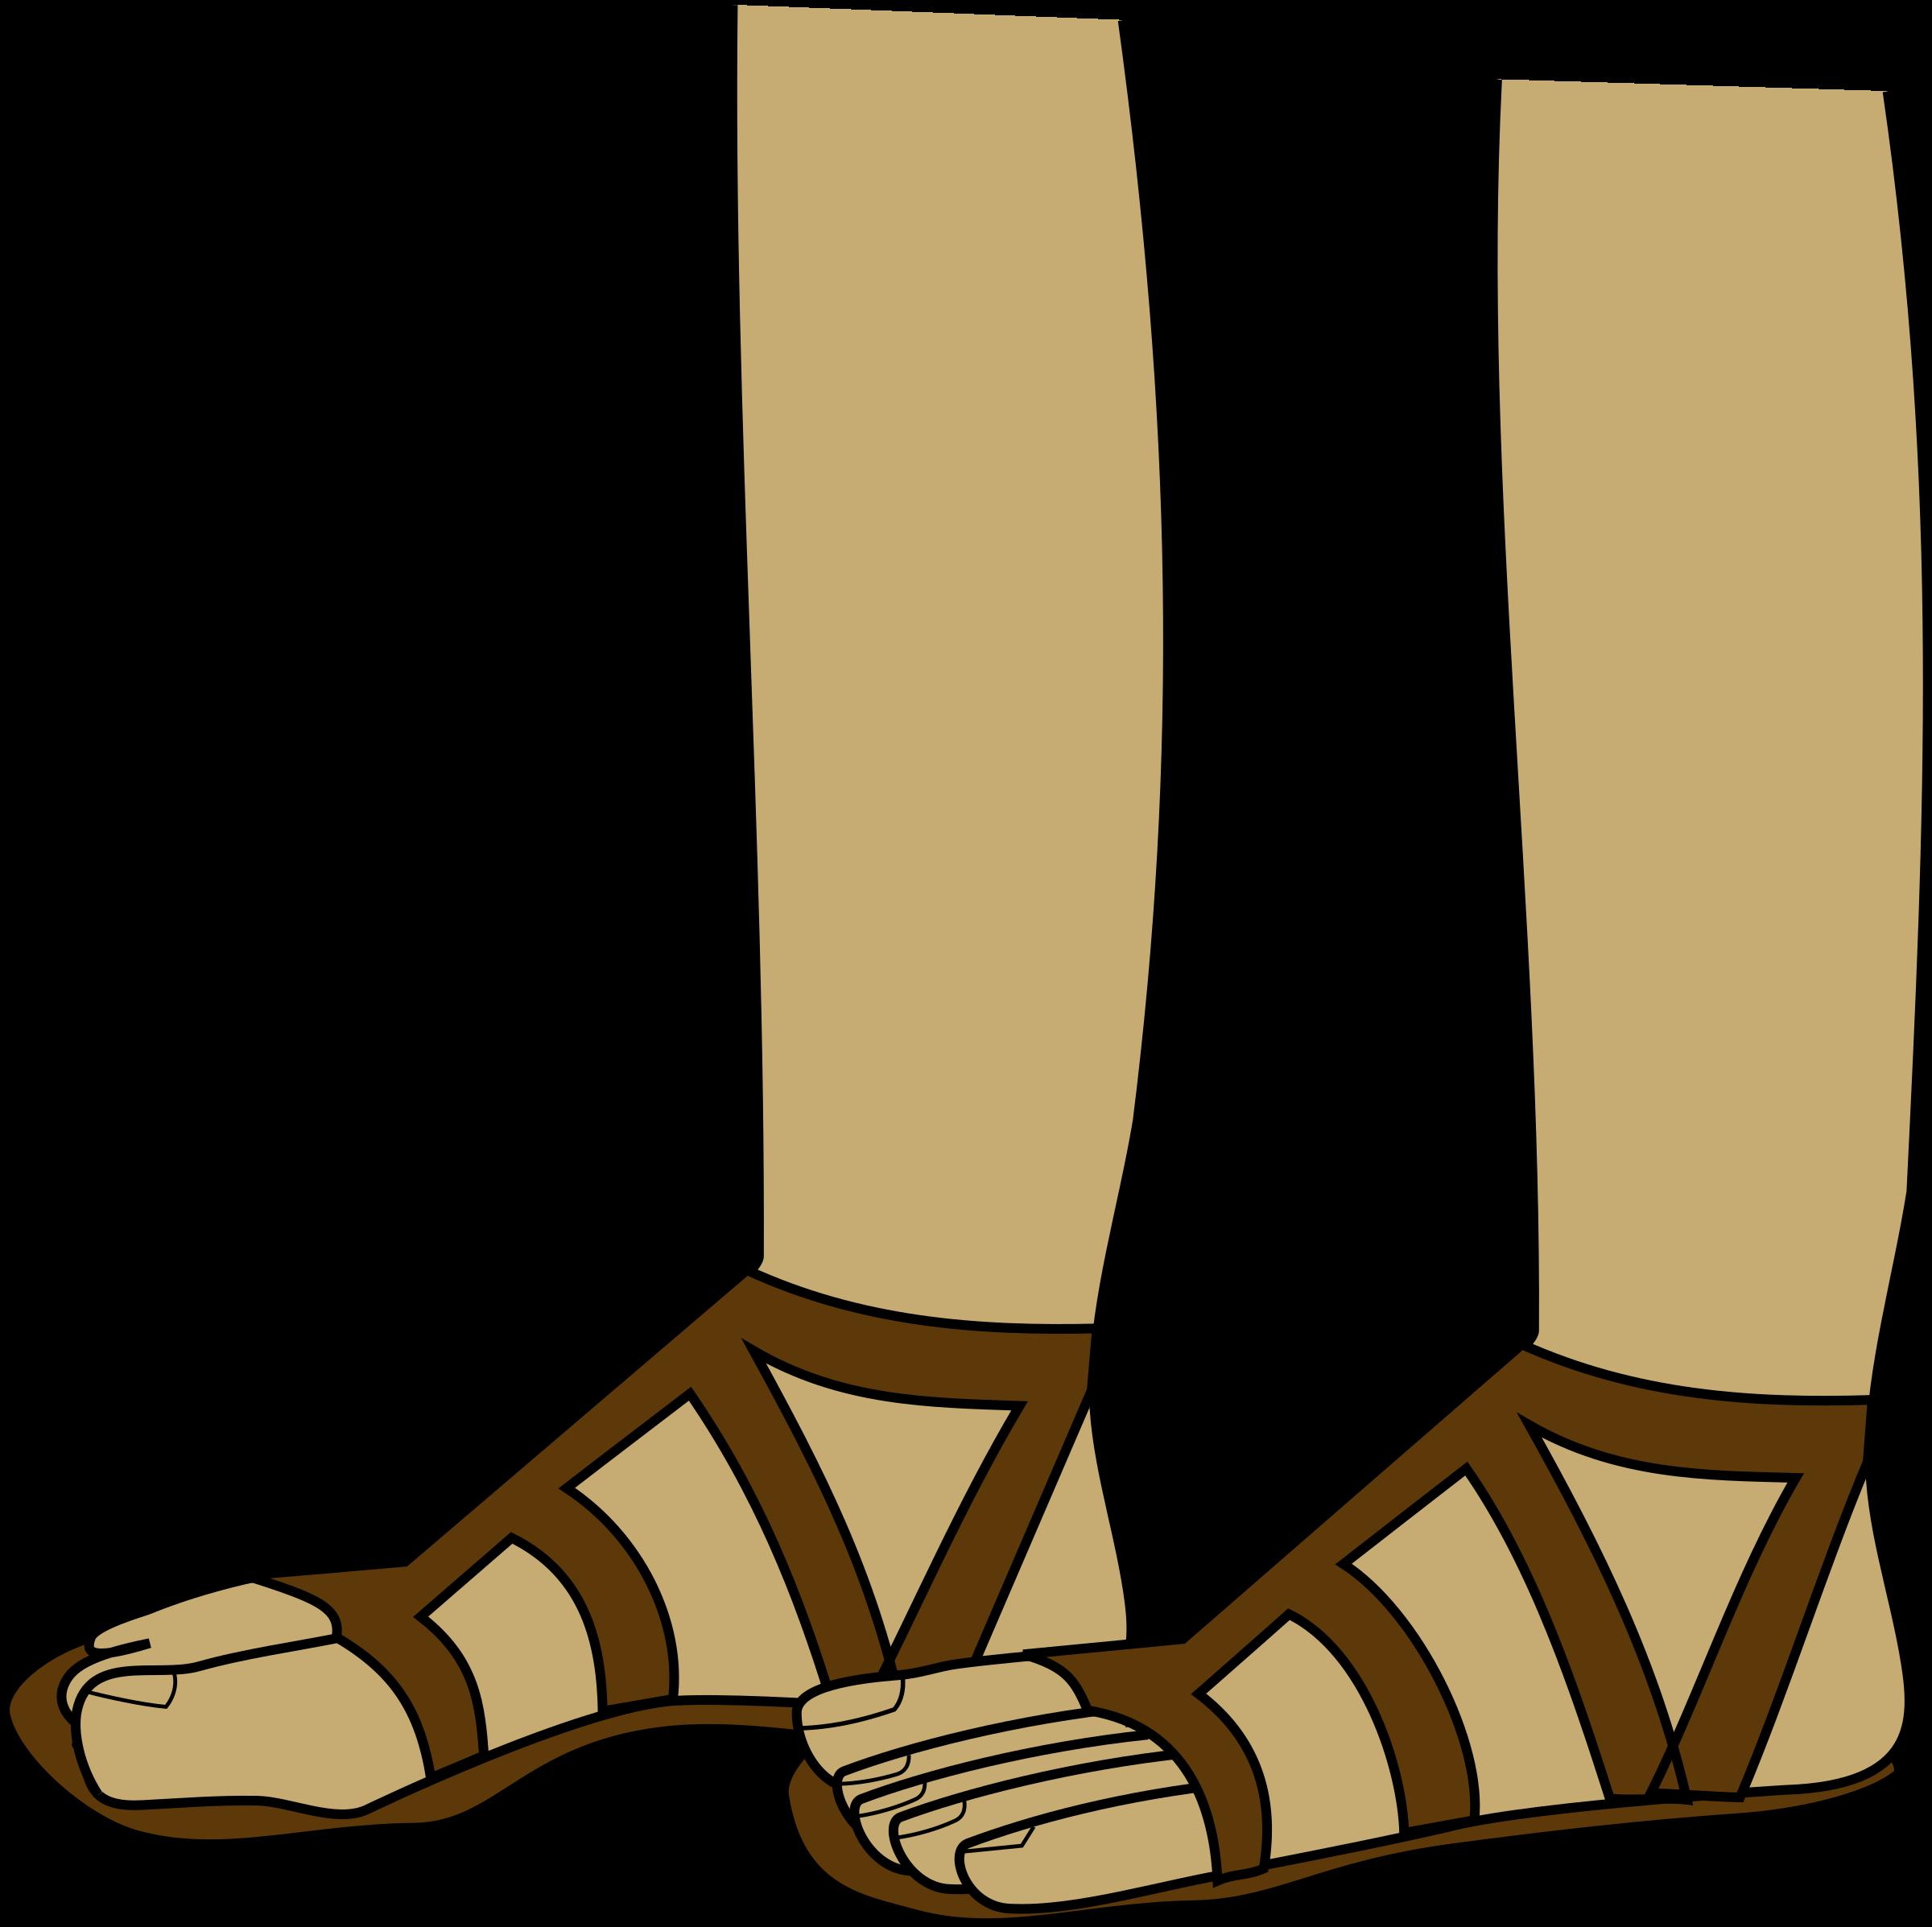 Feet in sandals big. Footprint clipart dress shoe